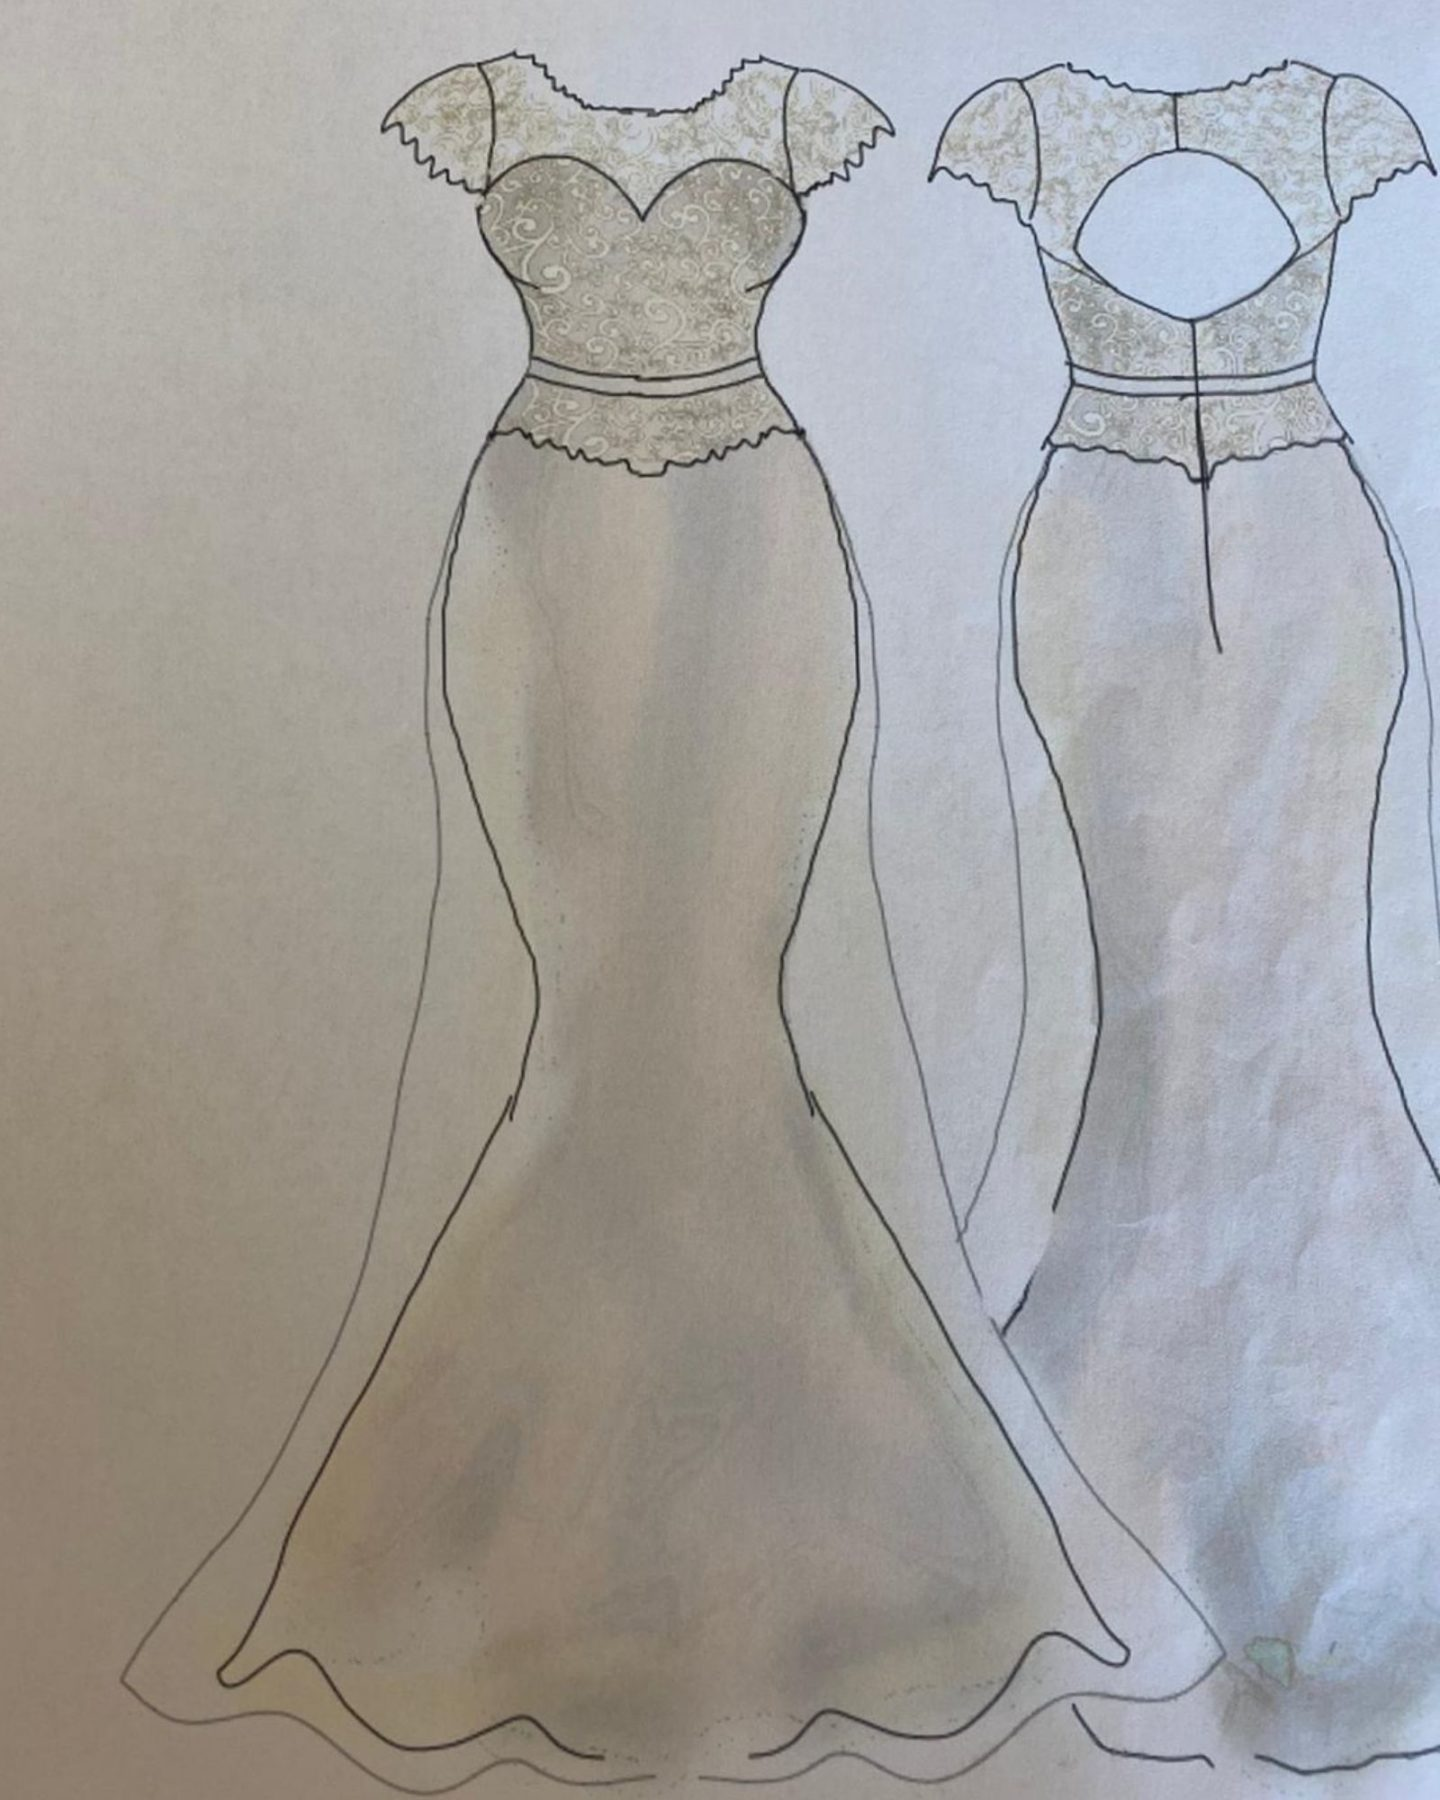 Bespoke wedding dress sketches by Boho Bride Boutique in Stratford Upon Avon